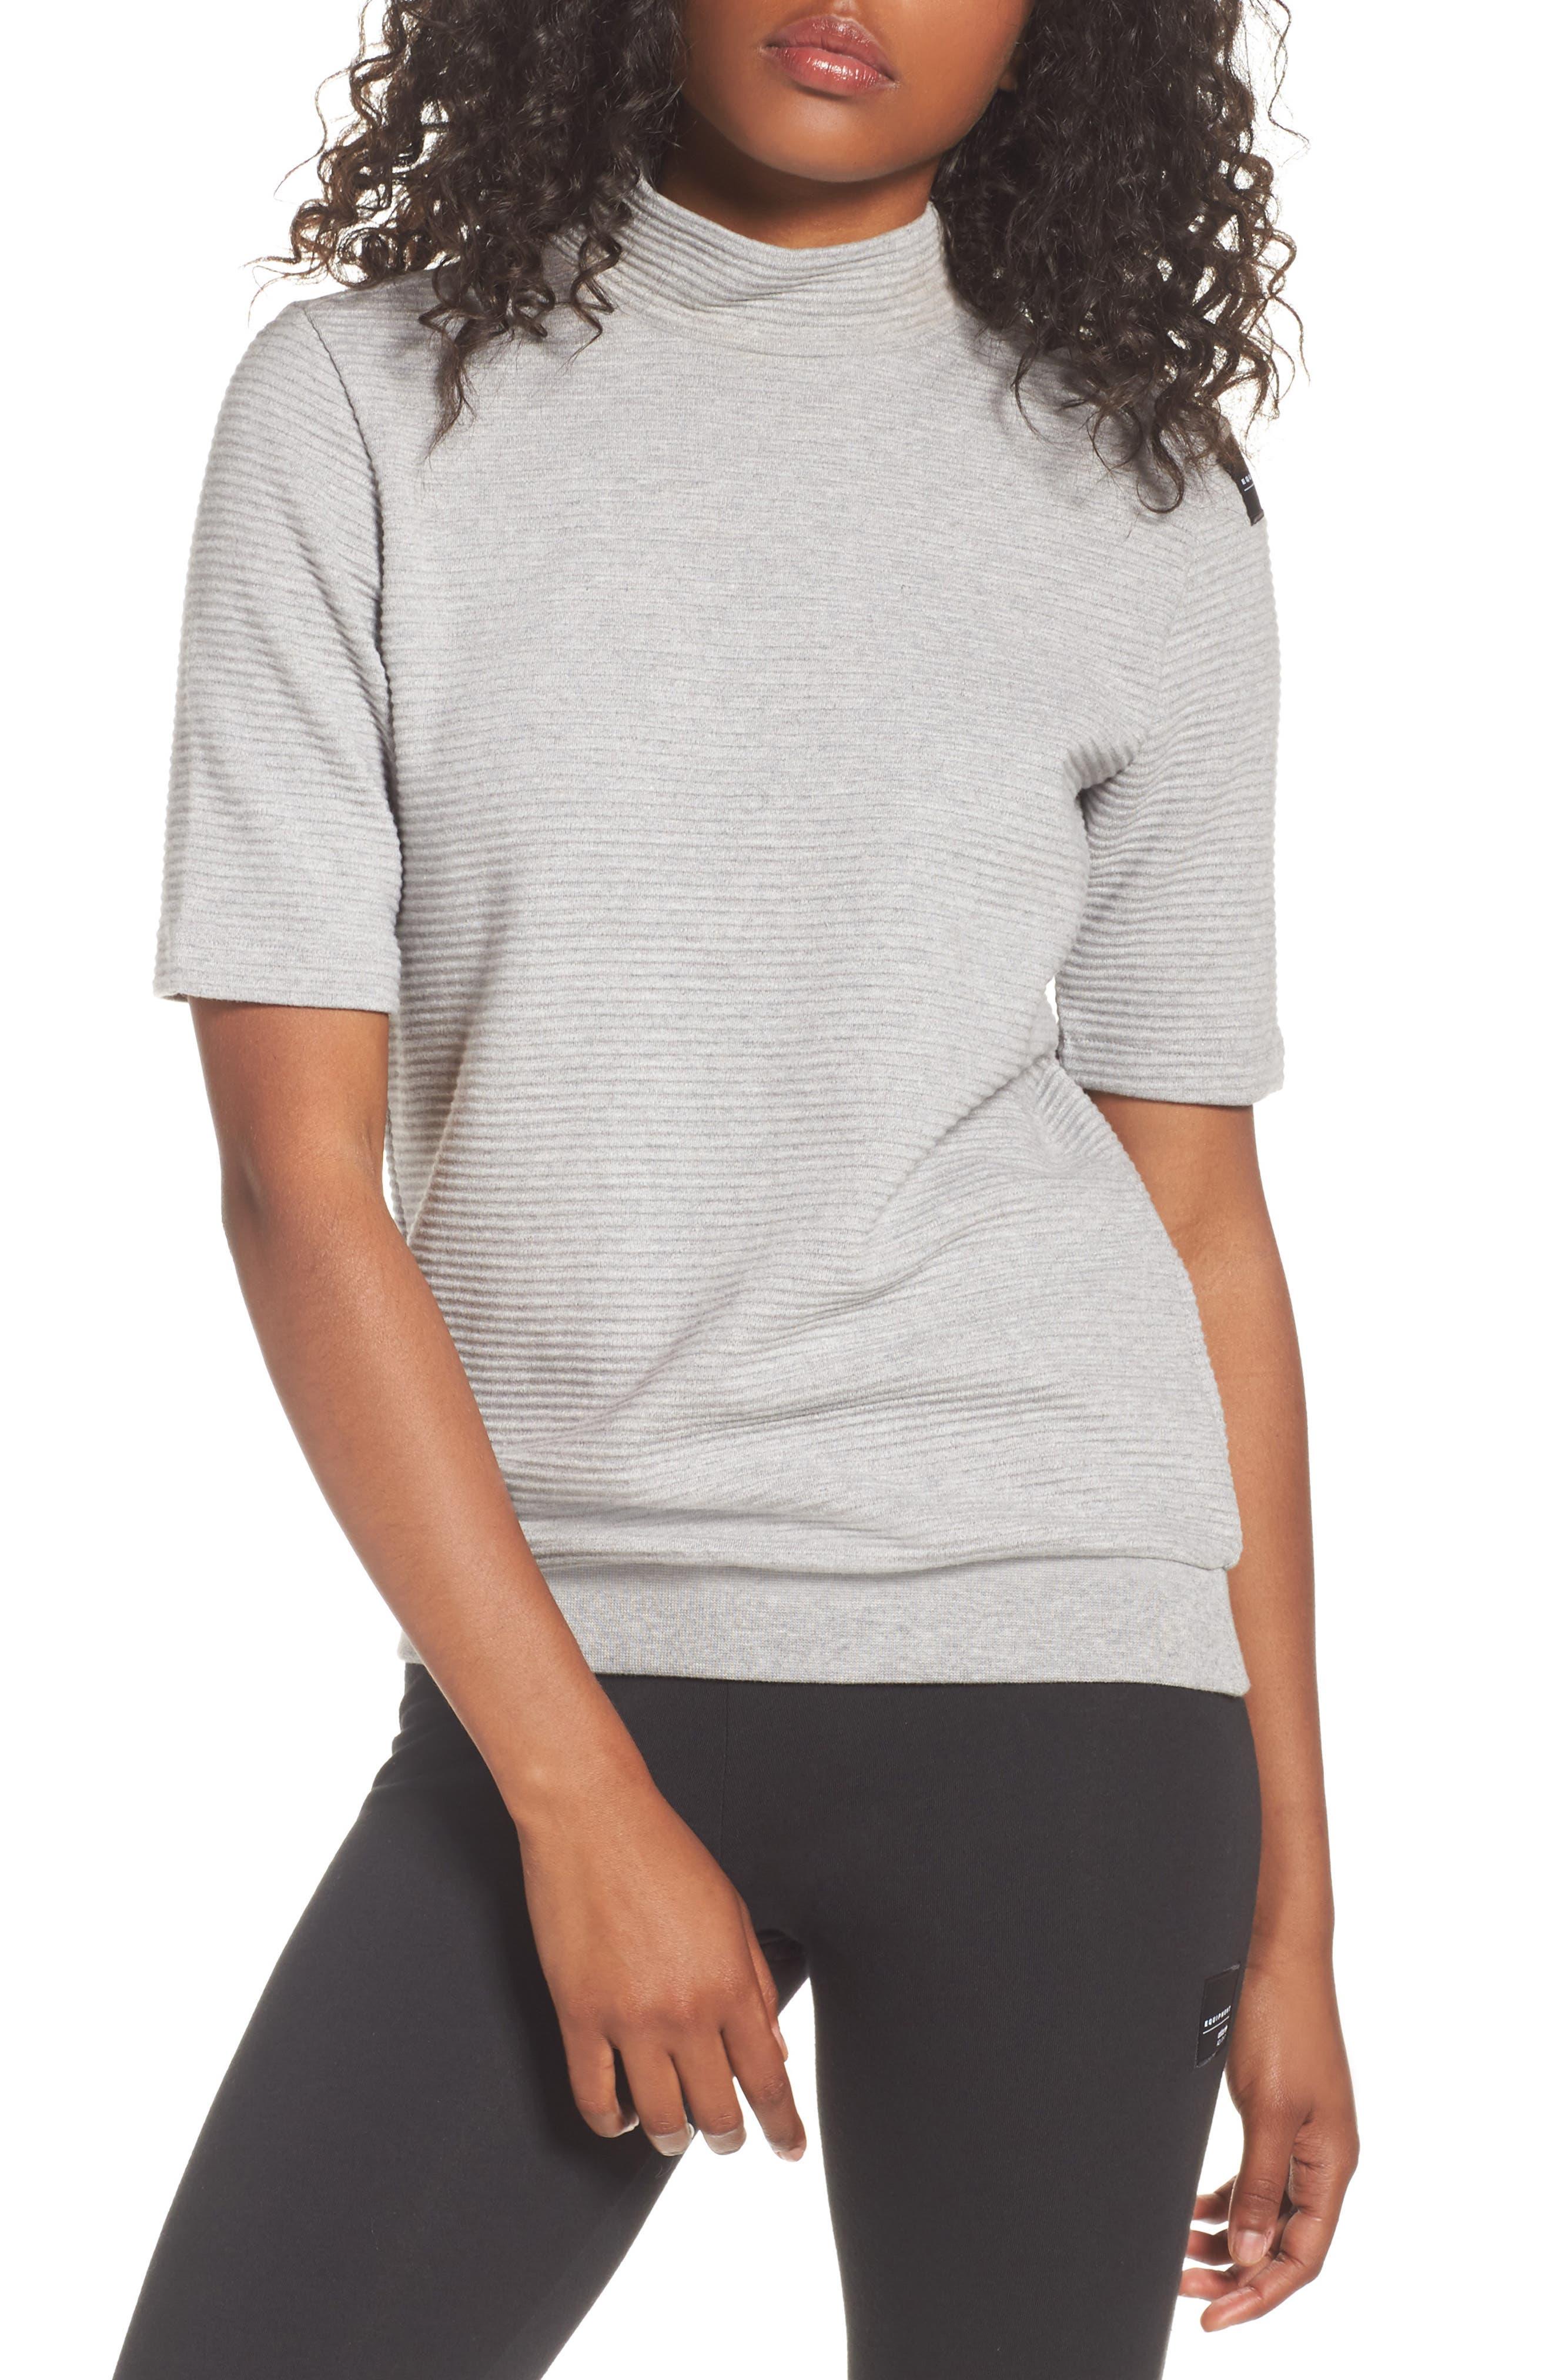 Main Image - adidas Originals EQT Sweatshirt